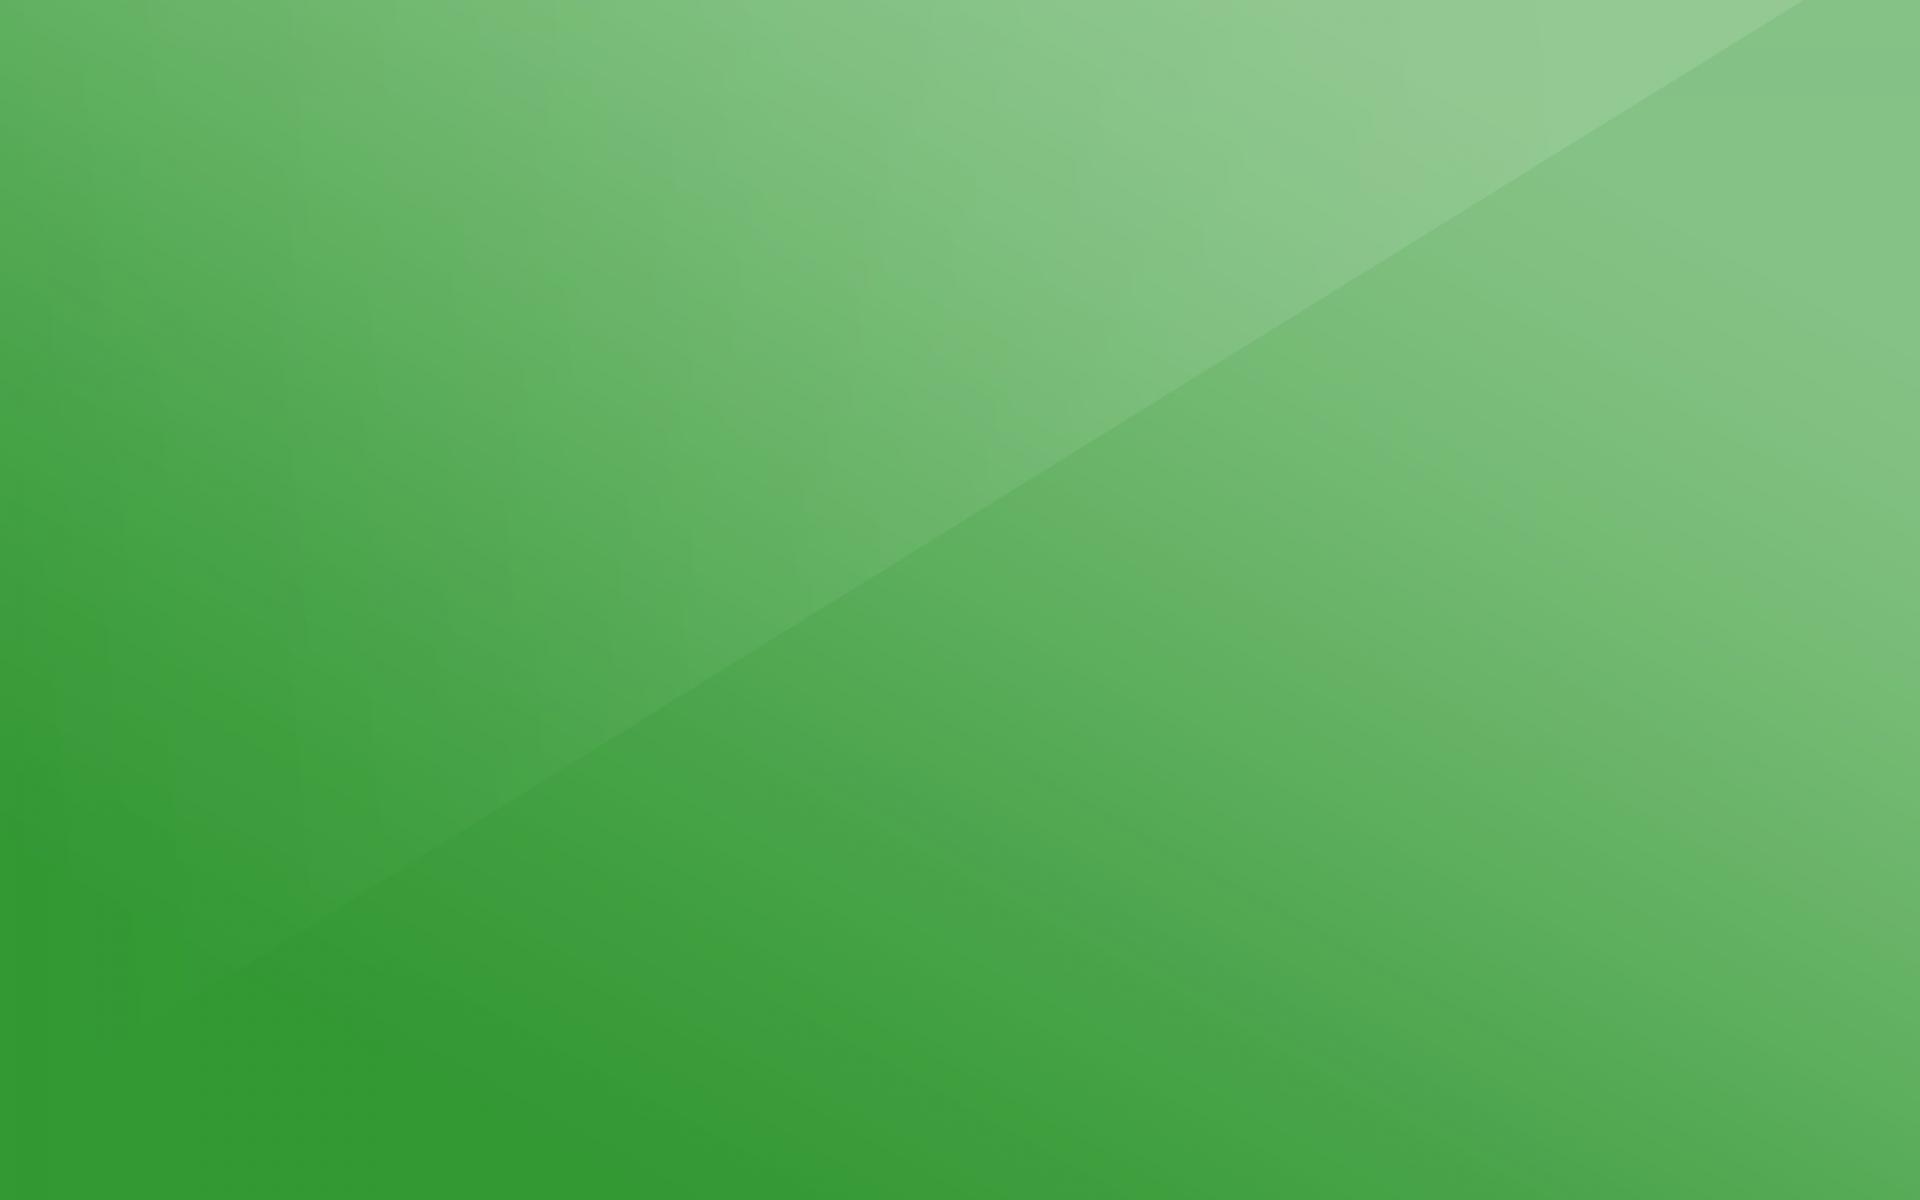 Fondo verde - 1920x1200